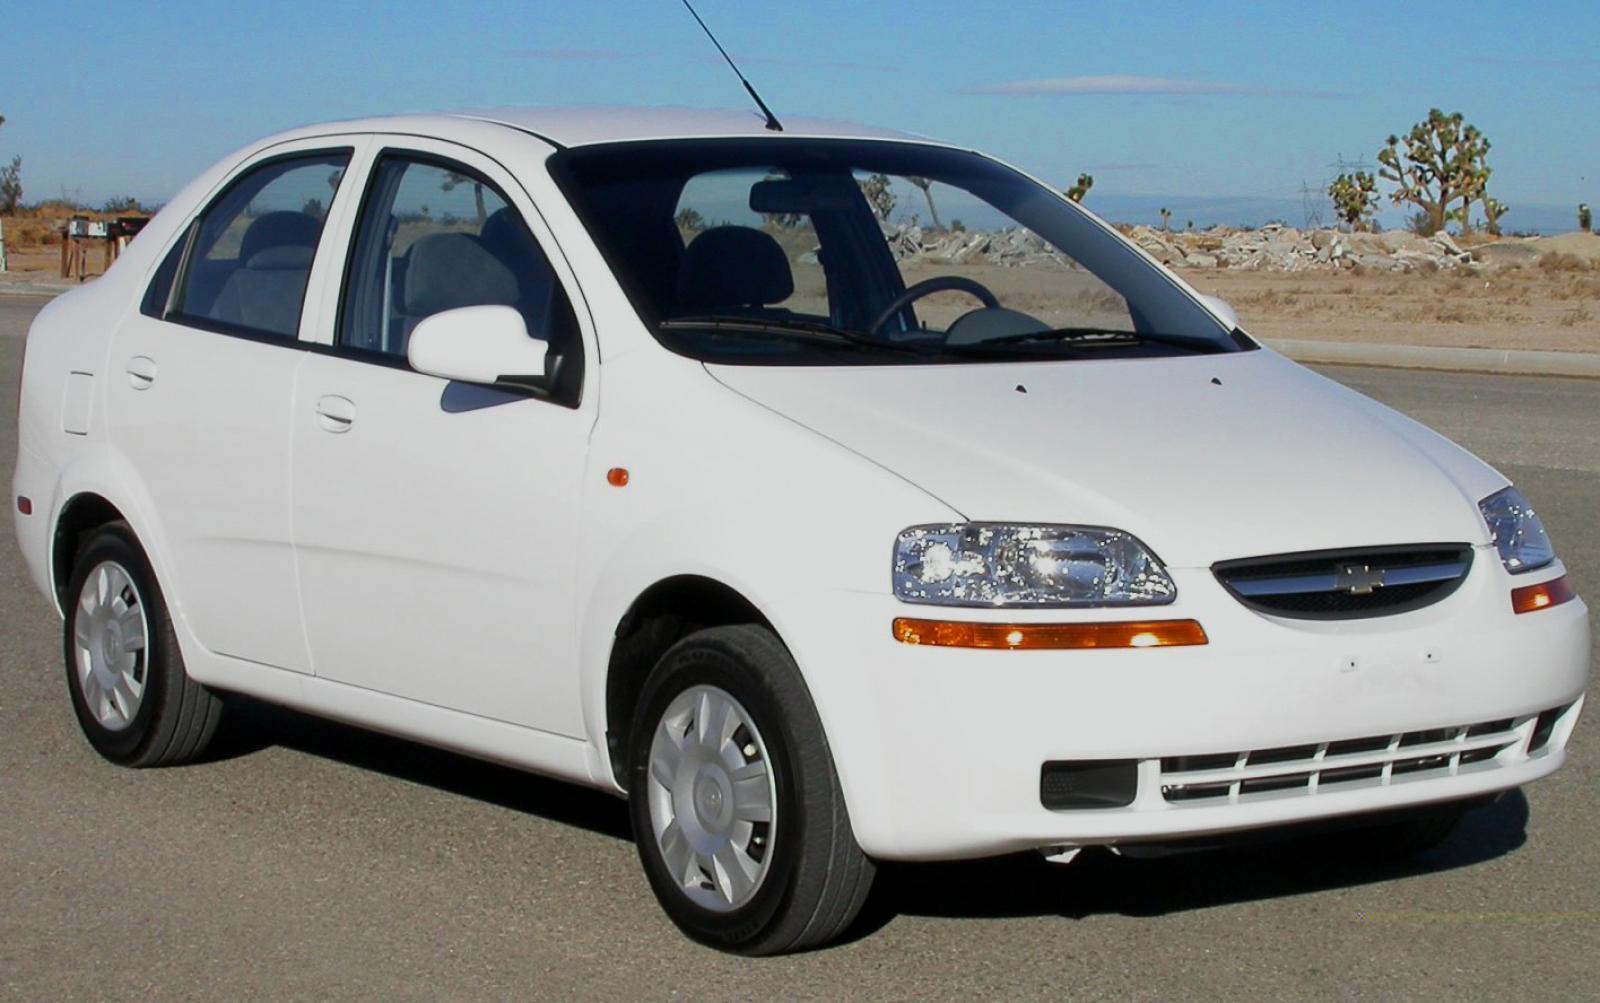 800 1024 1280 1600 origin 2004 Chevrolet Aveo ...